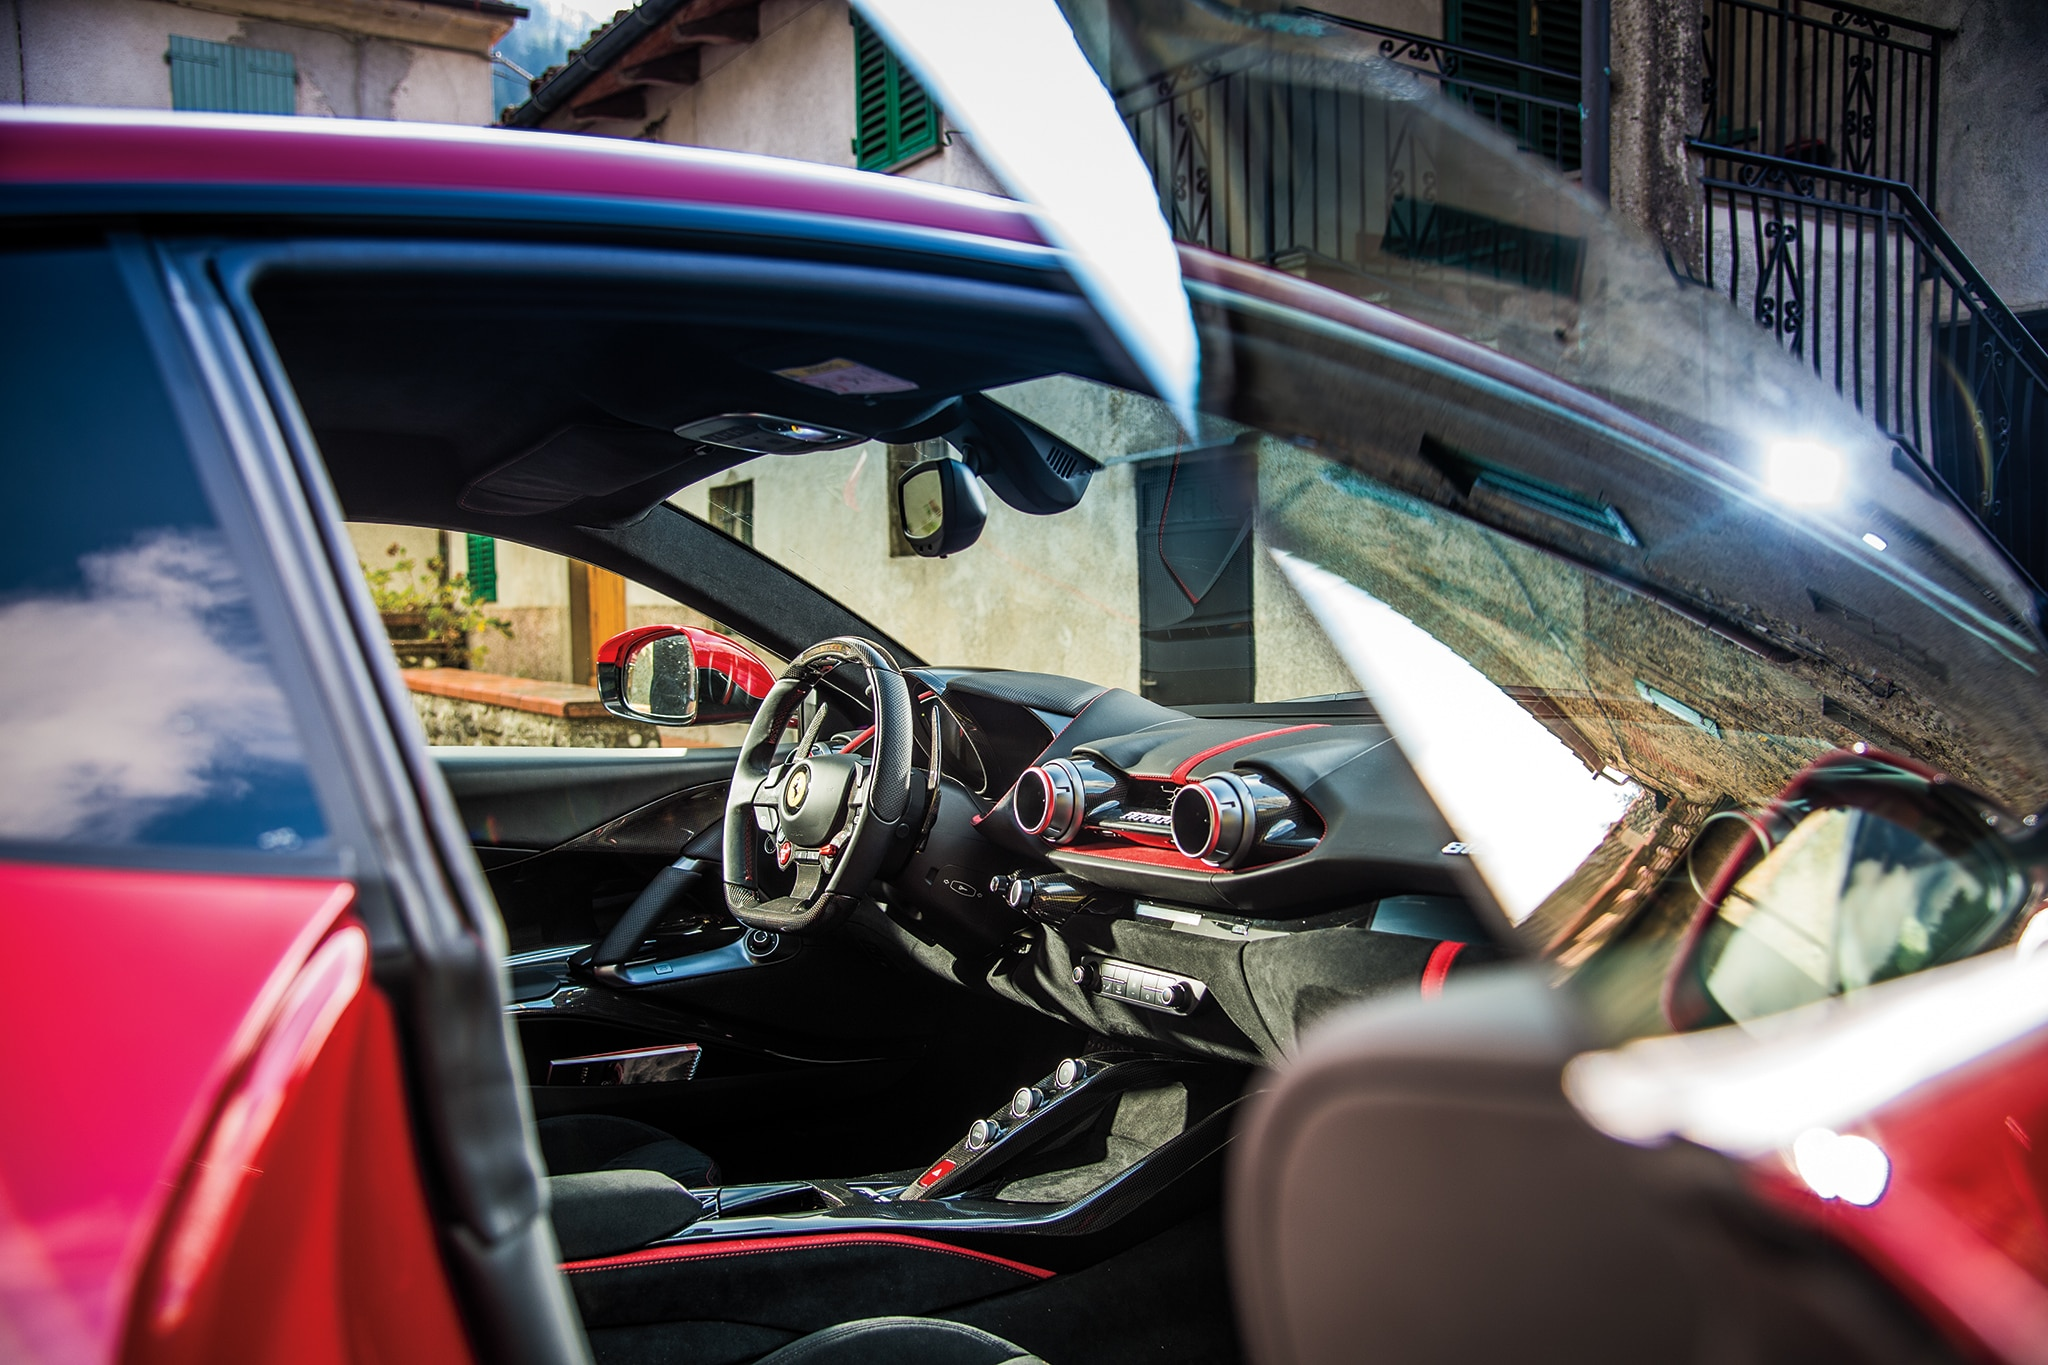 Striking 12s: Ferrari 812 Superfast vs. Lamborghini Aventador SVJ | Automobile Magazine